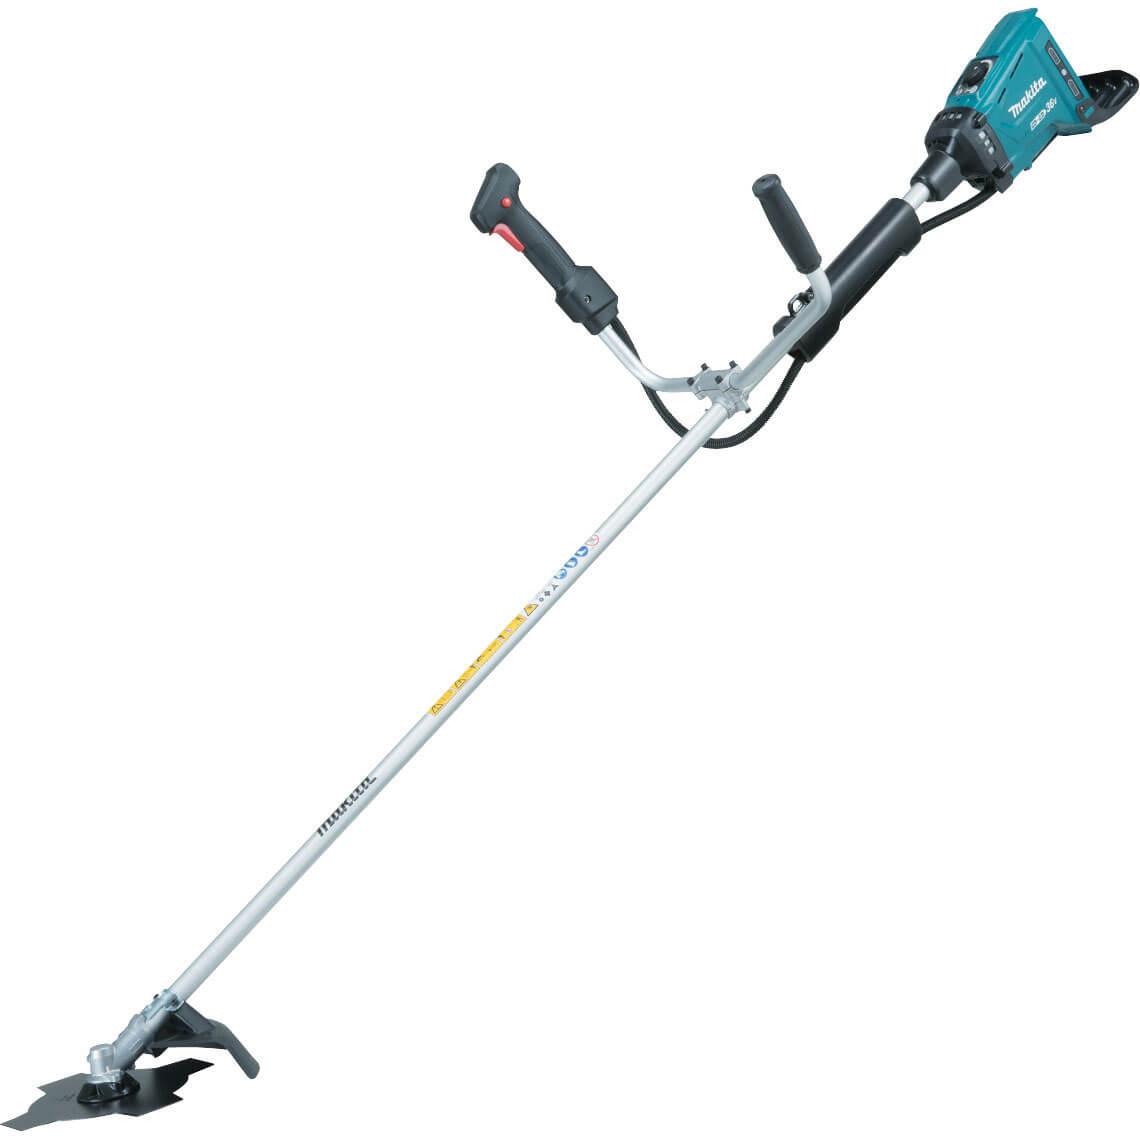 Makita Dur361uz 36v Cordless Lxt Brush Cutter 230mm Cut